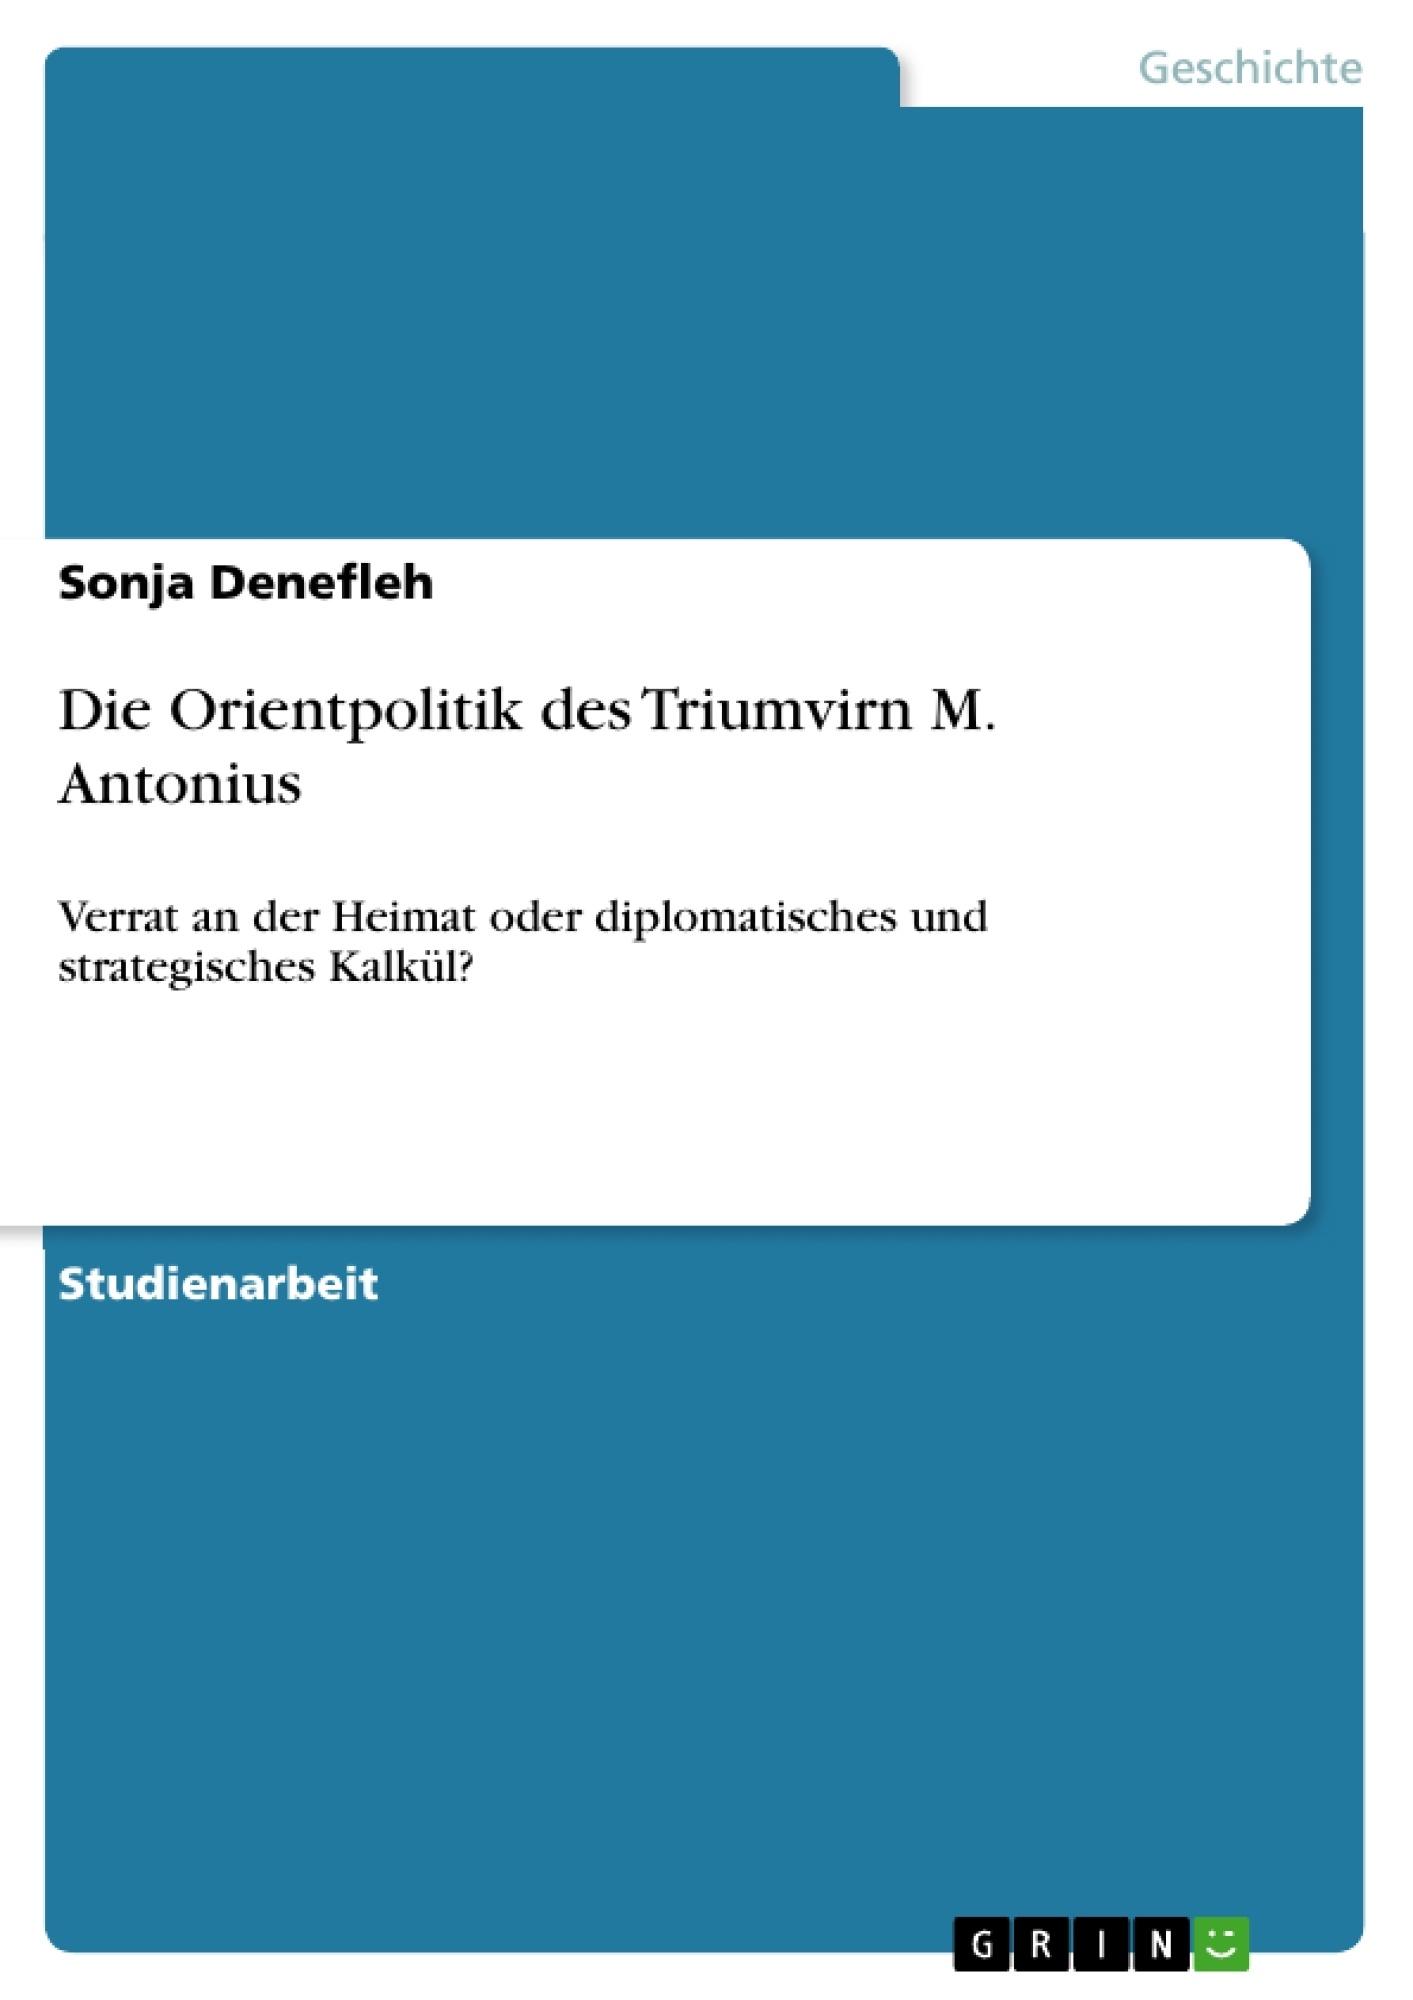 Titel: Die Orientpolitik des Triumvirn M. Antonius